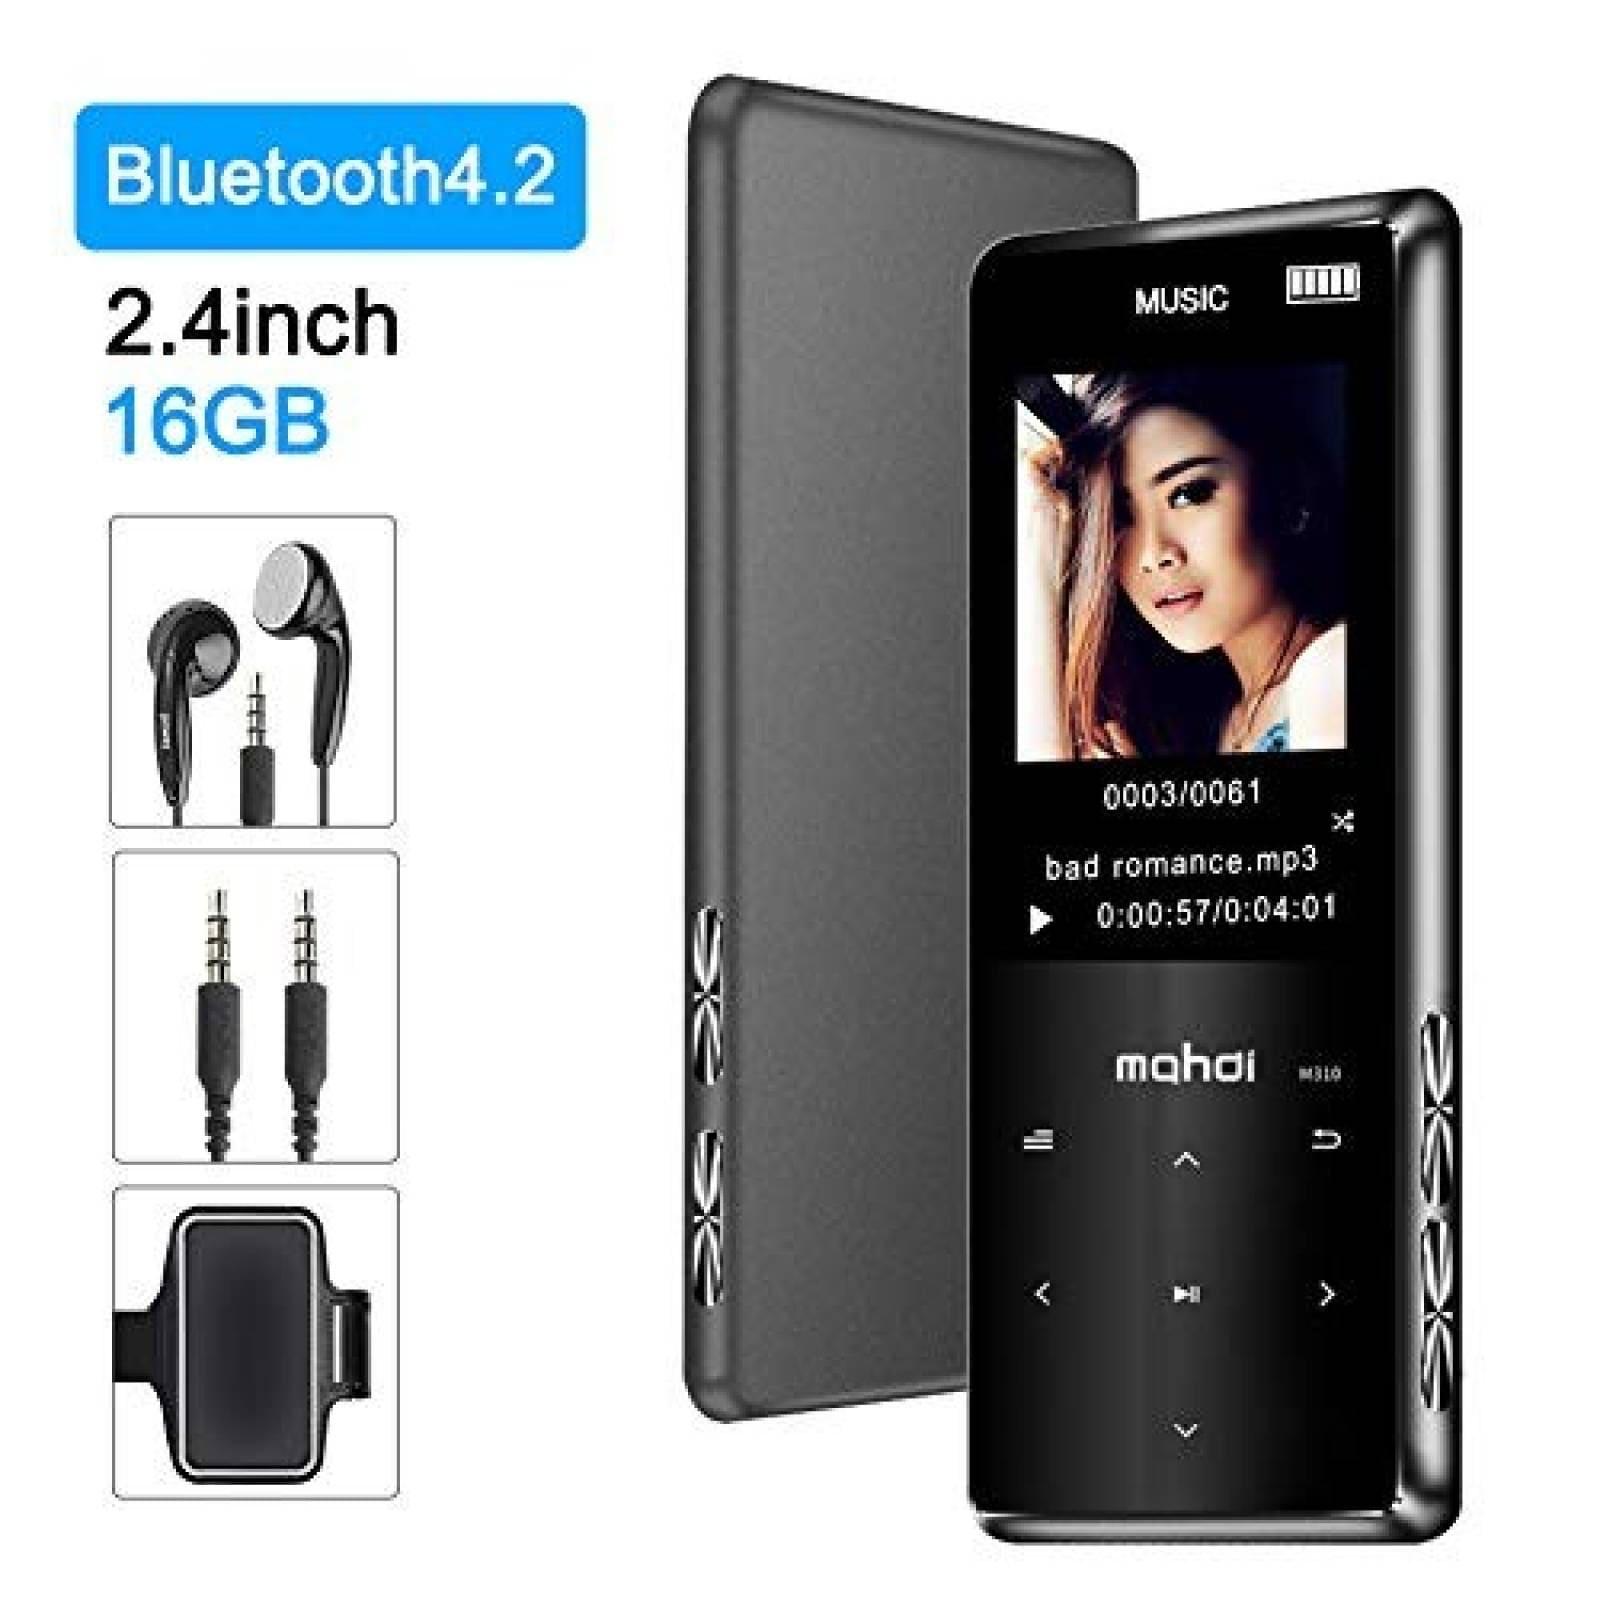 Reproductor MP3 Jimwey 16GB Radio FM Bluetooth 4.2 -Negro